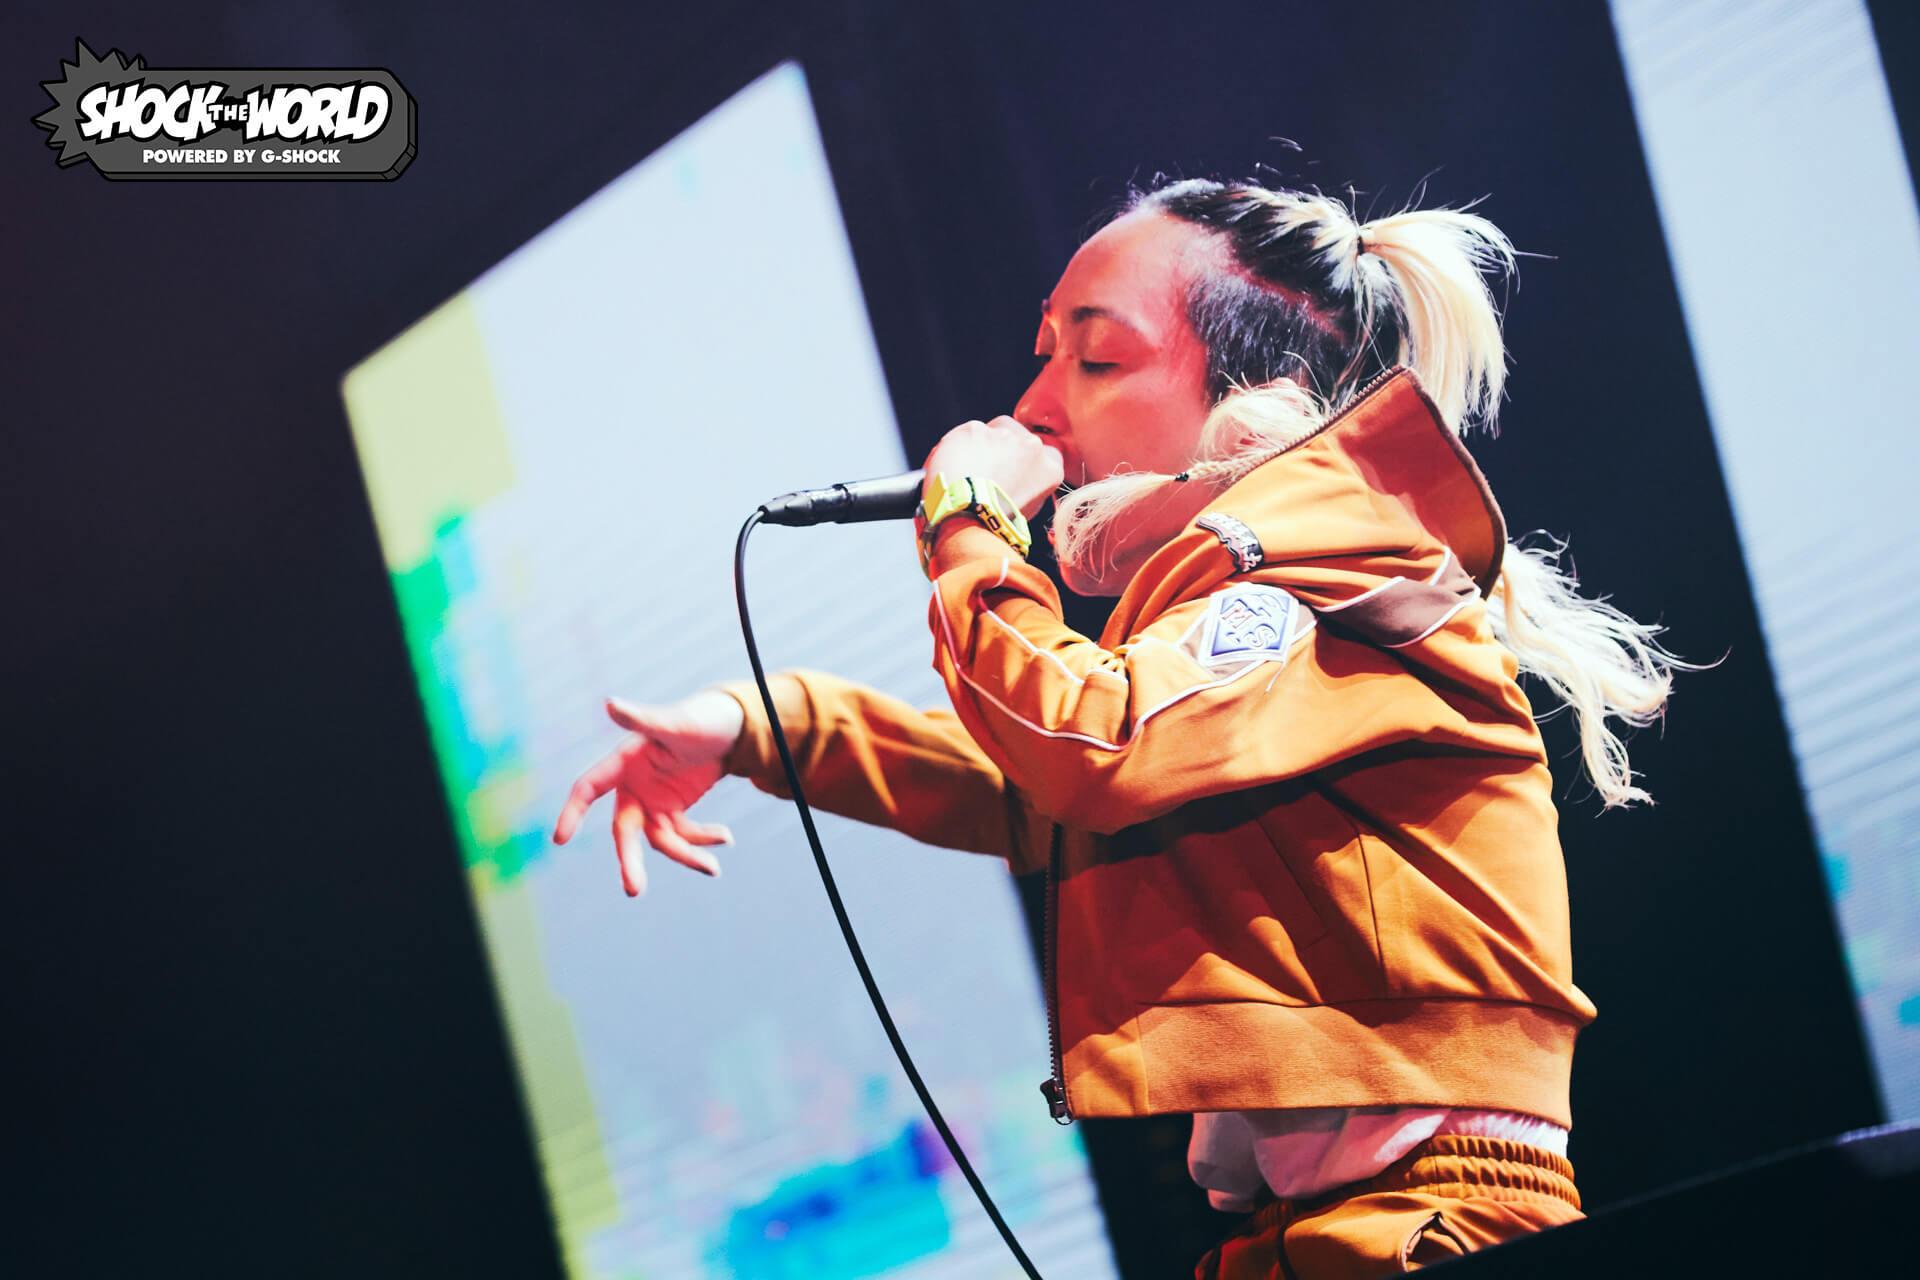 G-SHOCK『SHOCK THE WORLD』第6弾で80KIDZ、あっこゴリラ、YonYonのトーク&ライブセッションが実現! music210804_shocktheworld_5